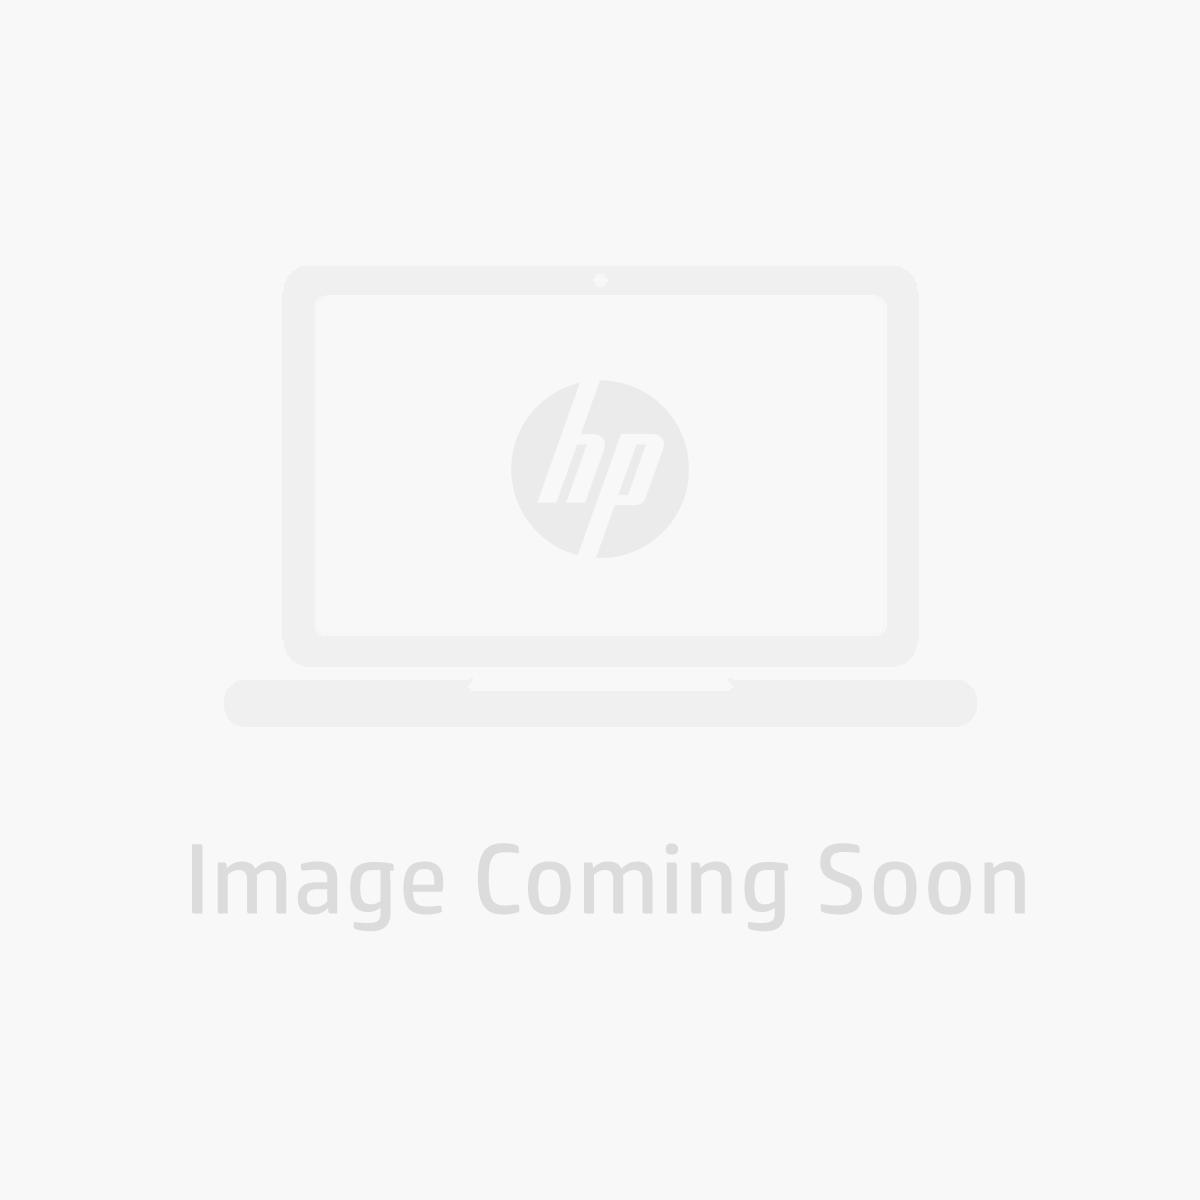 HP LaserJet Pro MFP M137fnw Printer